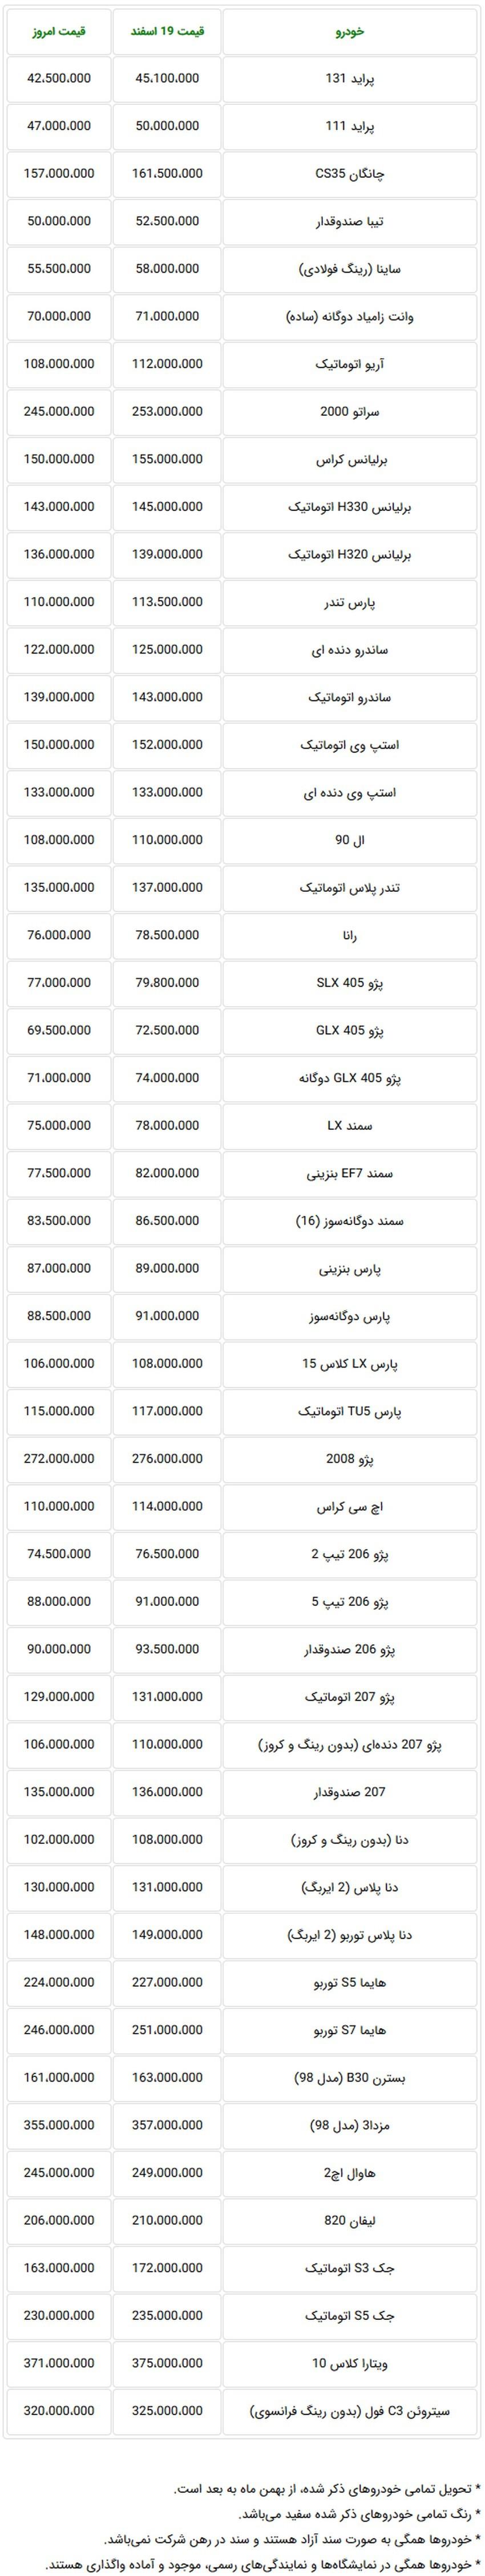 Screenshot_2019-03-16 قیمت جدید خودرو در بازار تهران امروز پنجشنبه 23 اسفندماه 97.jpg